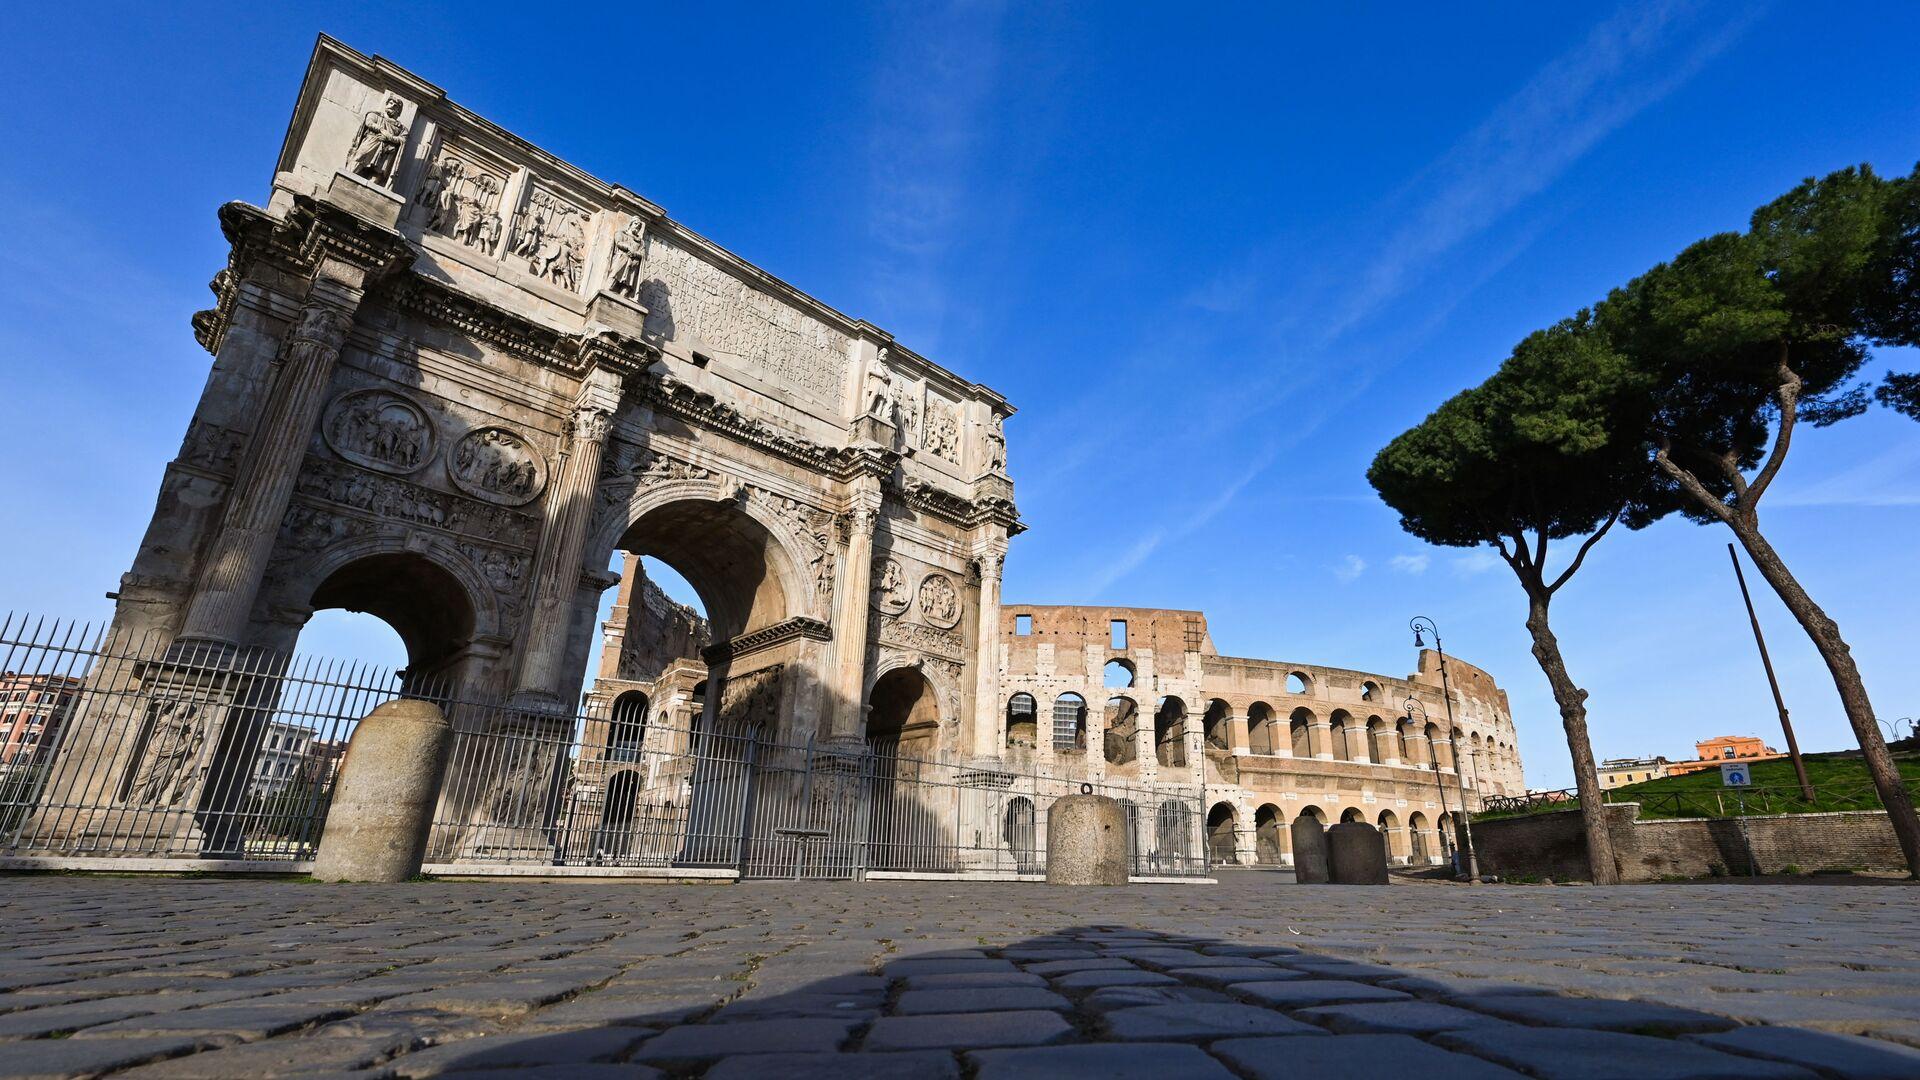 Colosseo deserto a Roma - Sputnik Italia, 1920, 09.06.2021